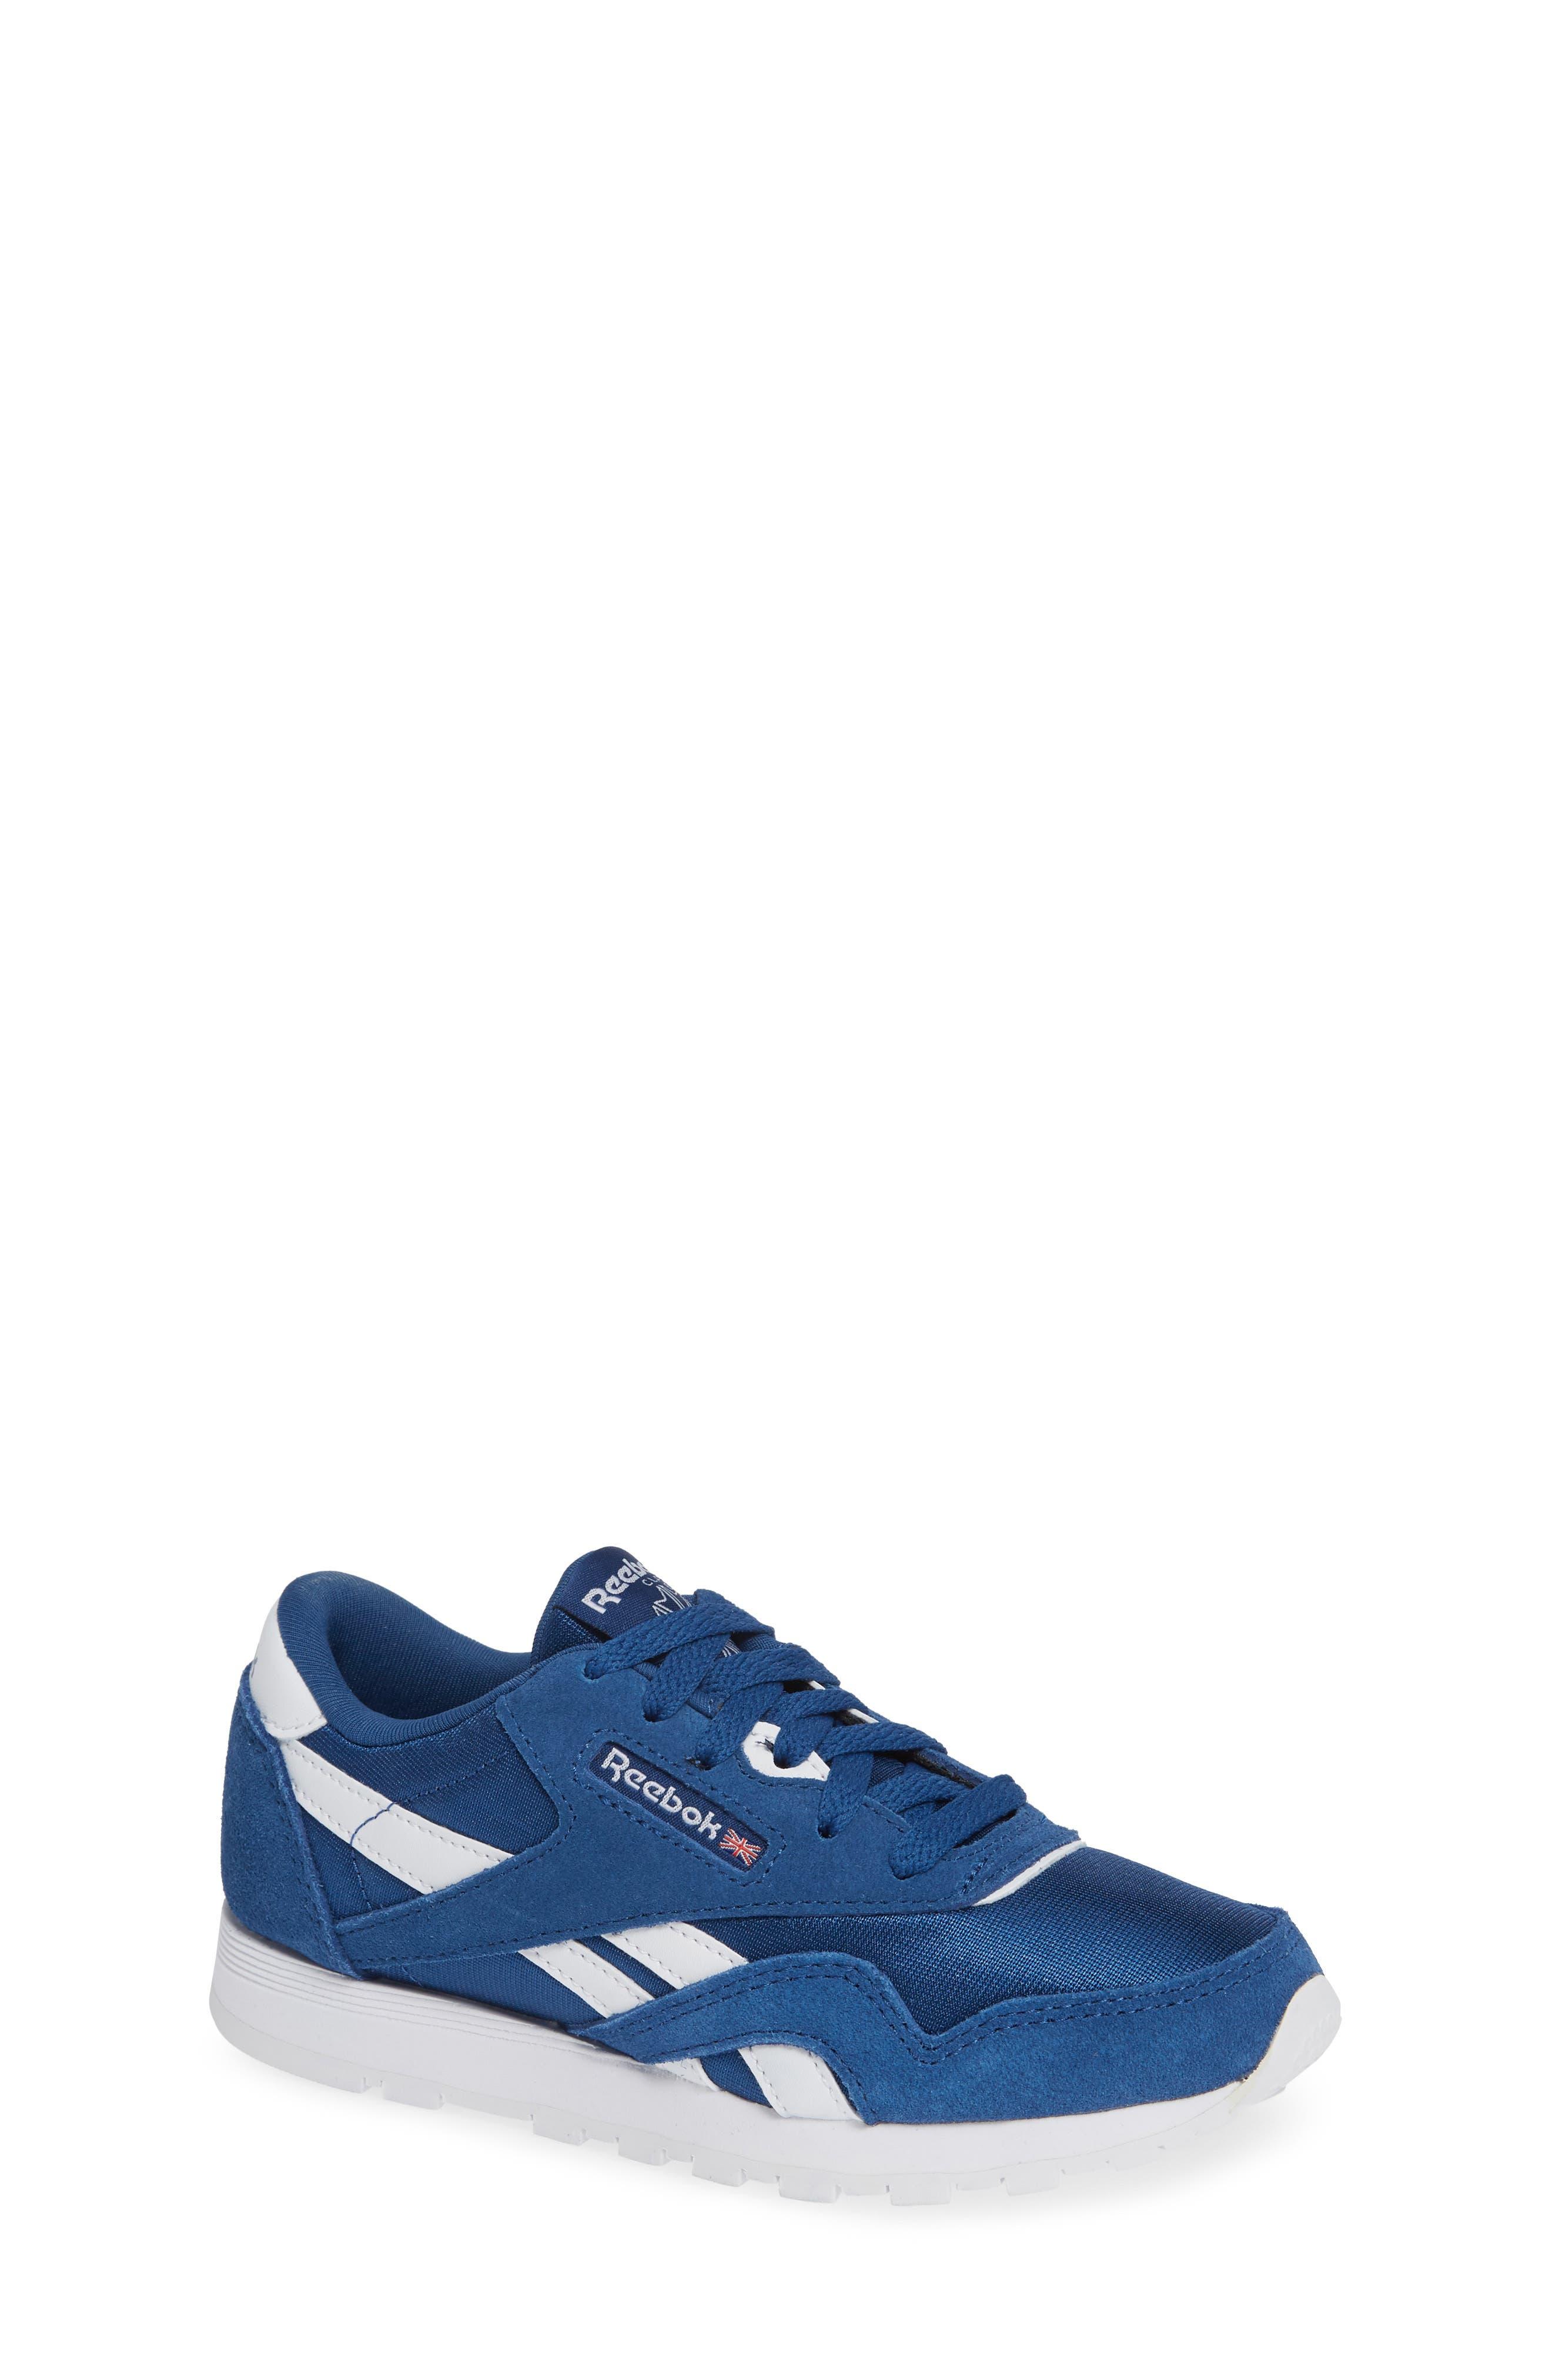 Classic Nylon Sneaker,                             Main thumbnail 1, color,                             Bunker Blue/ White